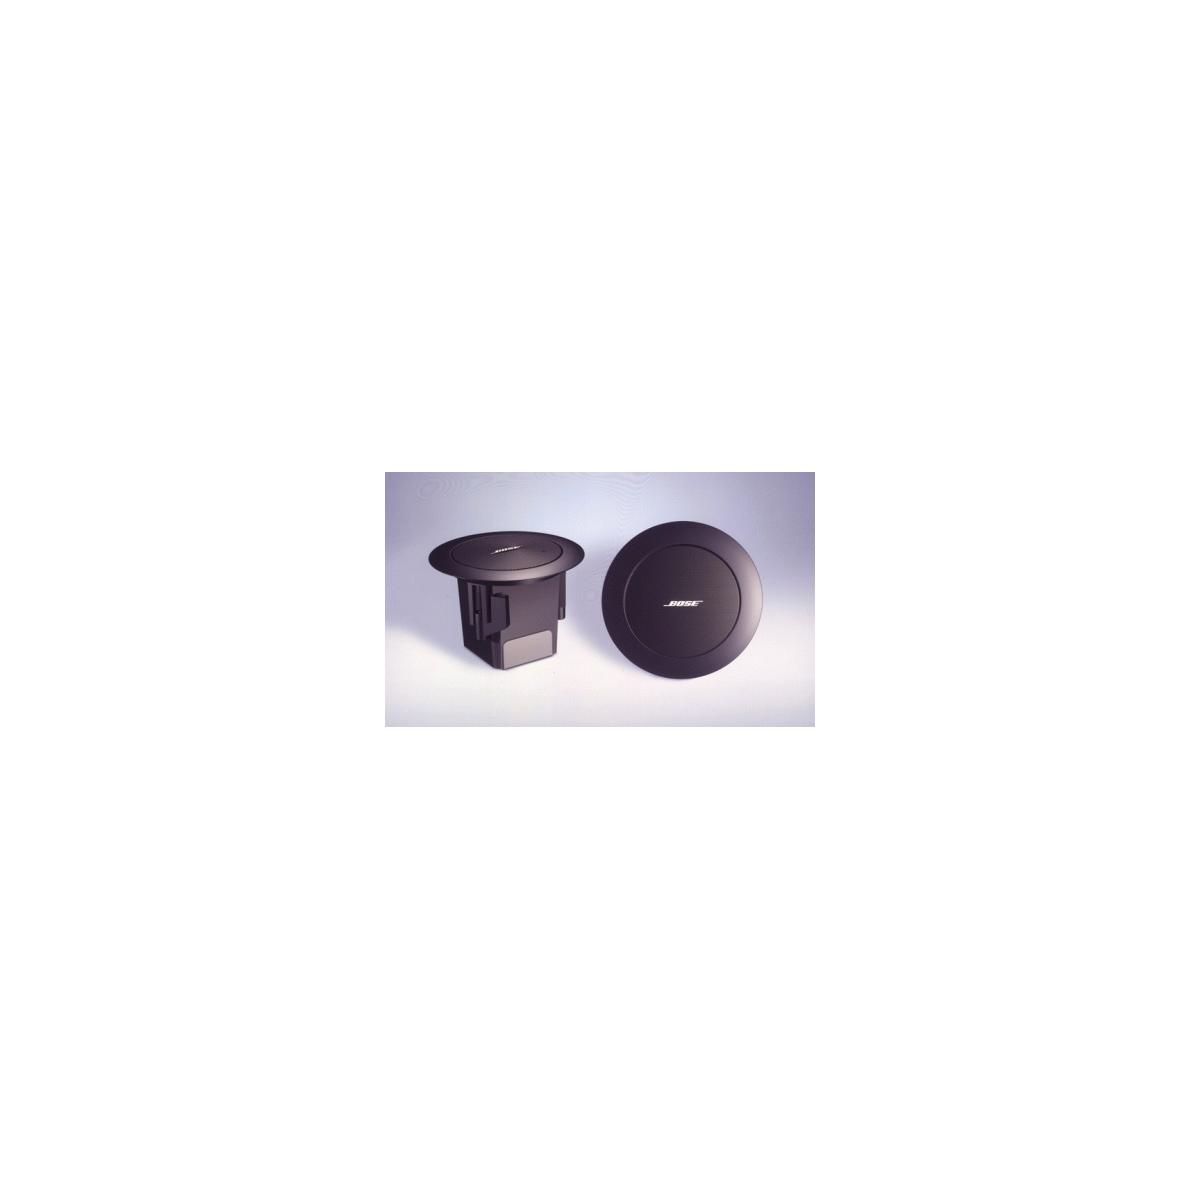 Enceintes plafonniers - Bose ® - Enceinte FreeSpace® 3F Noir...